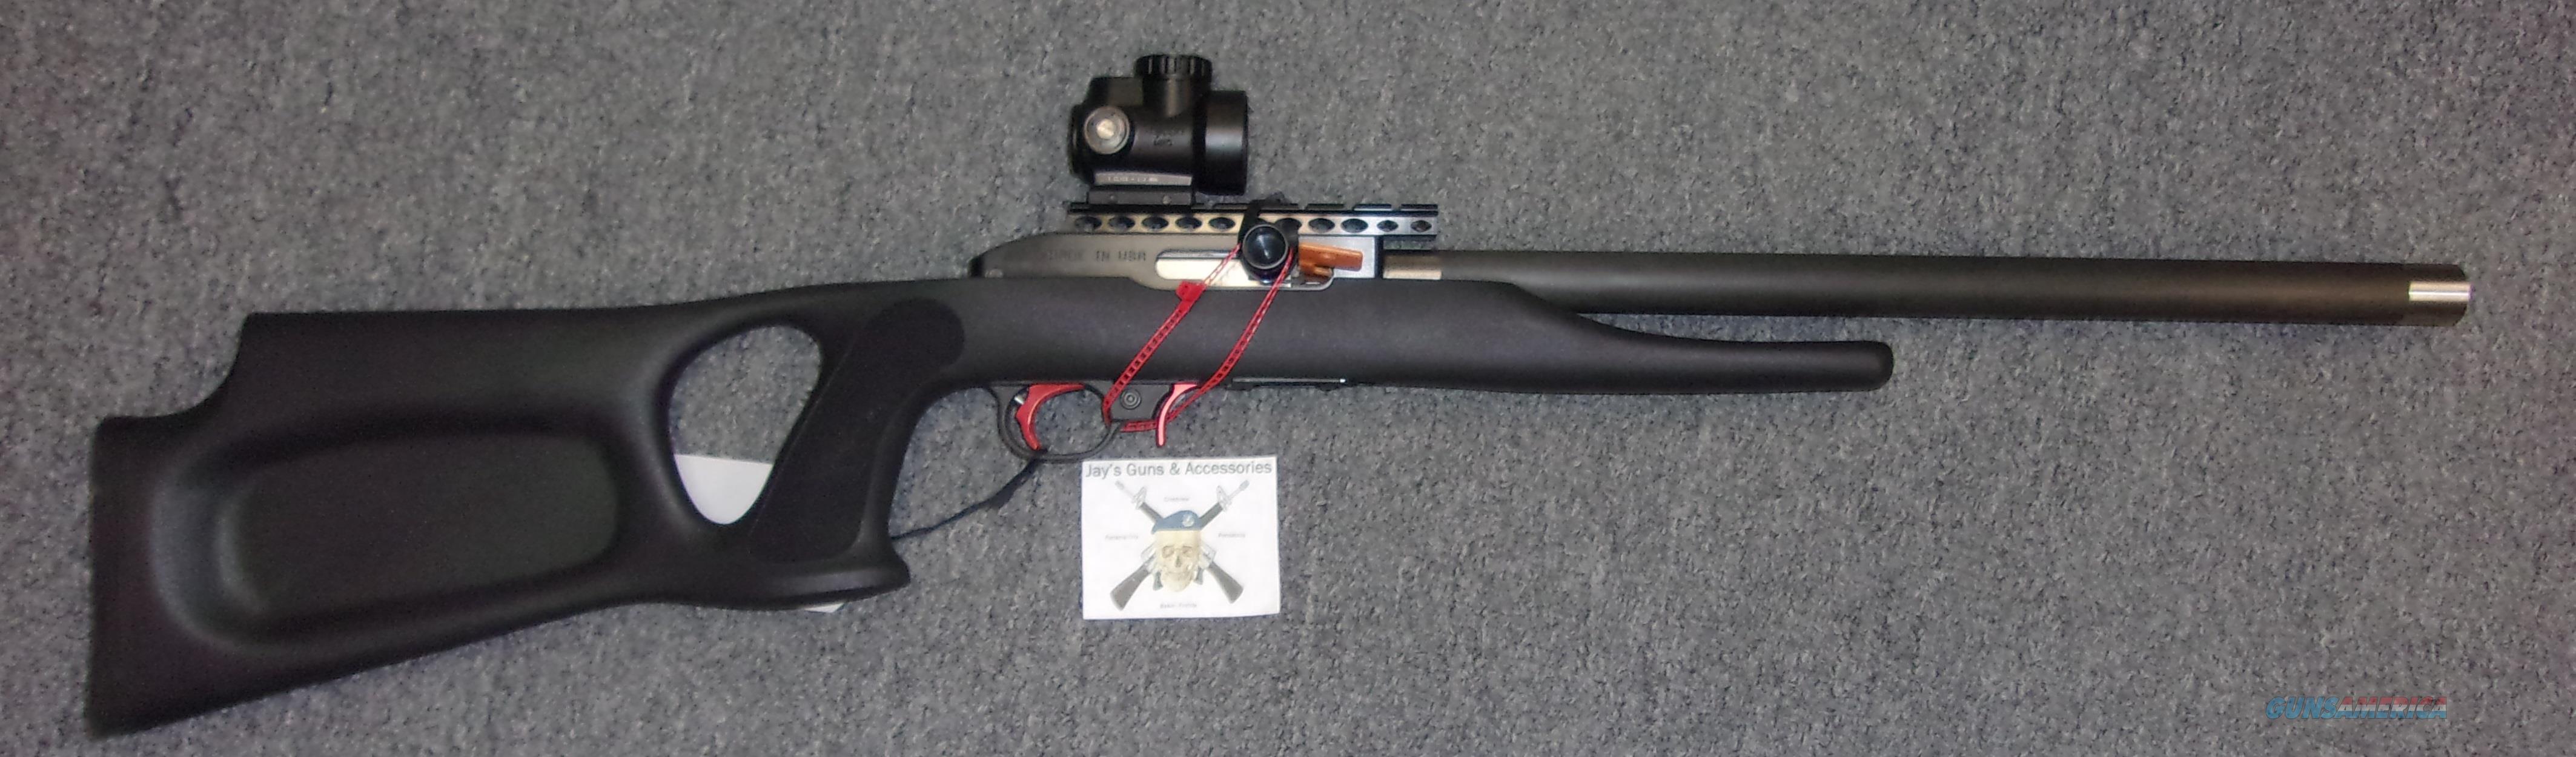 Magnum Research MLR-1722 w/Red Dot  Guns > Pistols > Magnum Research Pistols